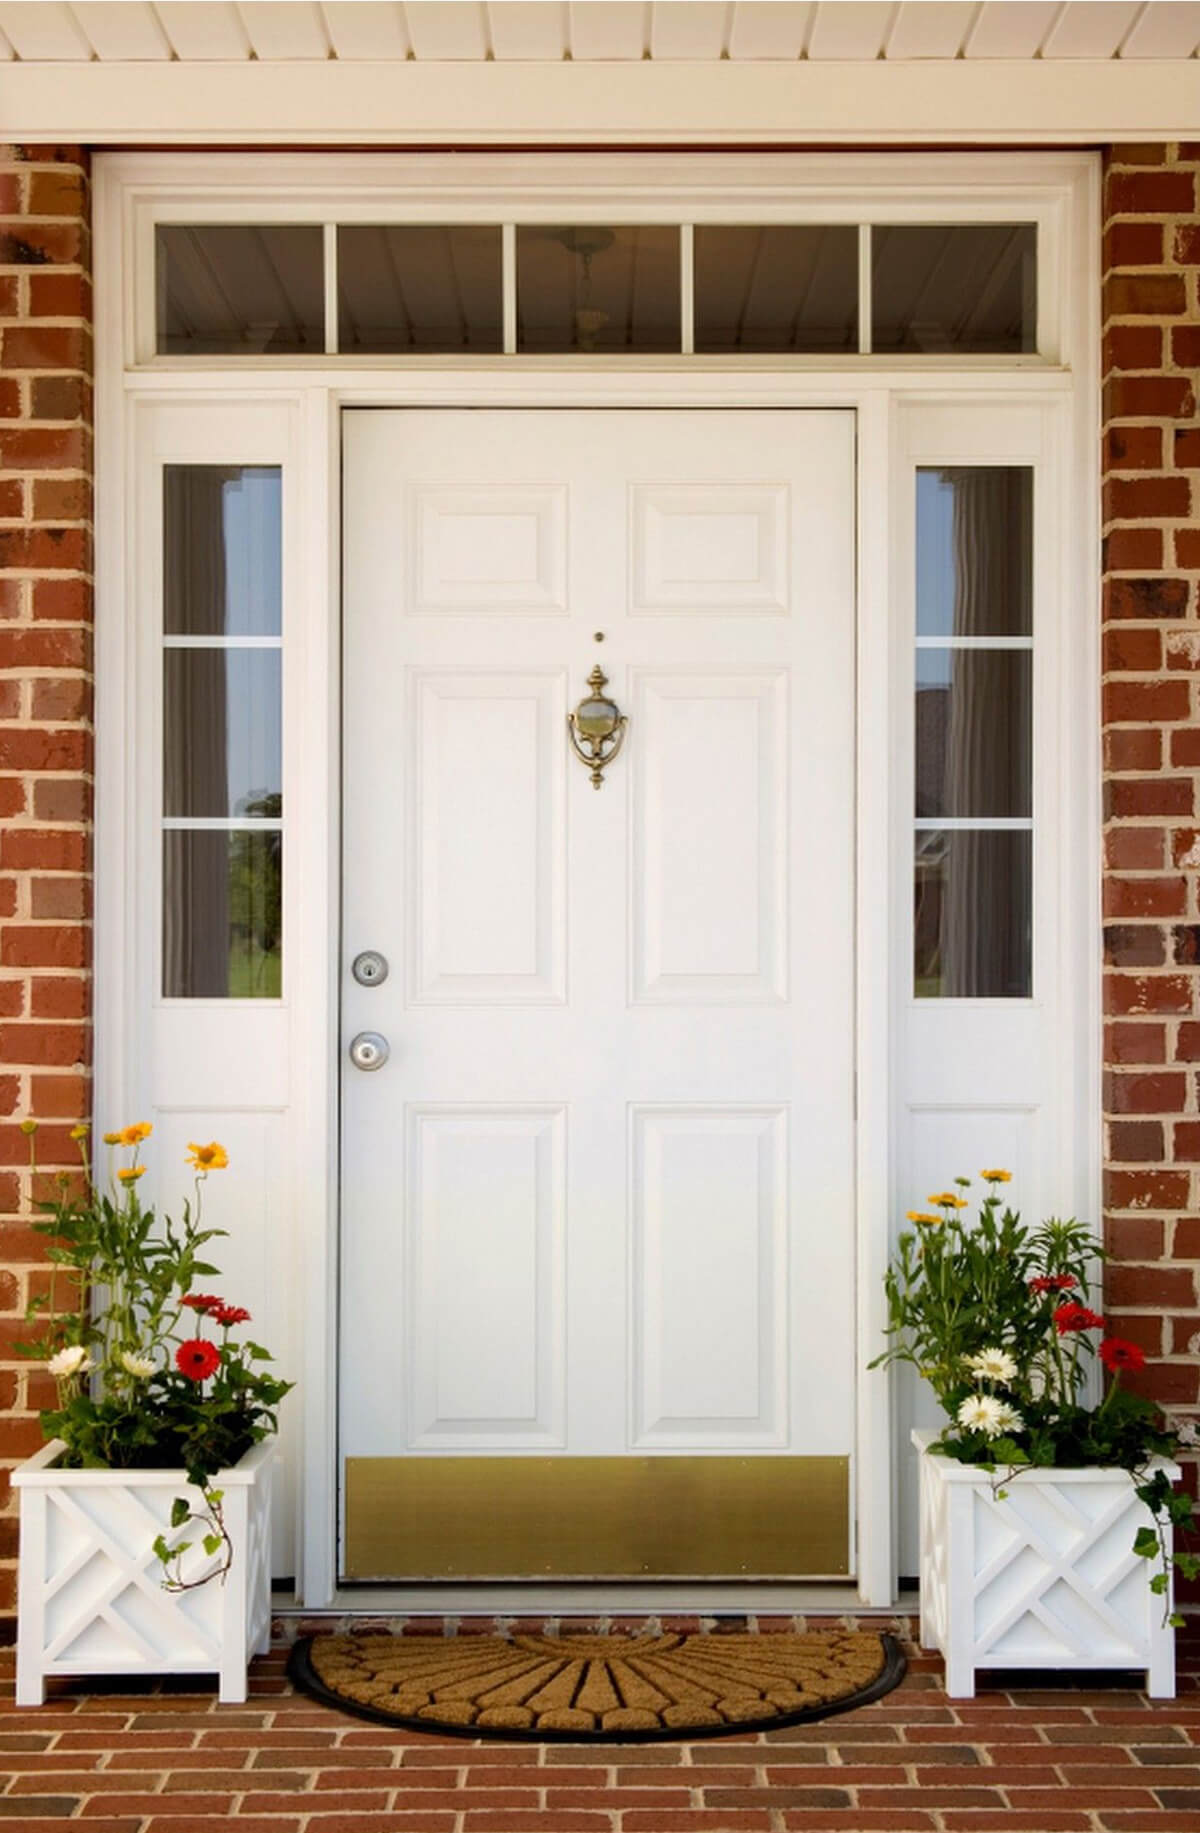 30 Best Front Door Color Ideas and Designs for 2020 on Door Color Ideas  id=34906